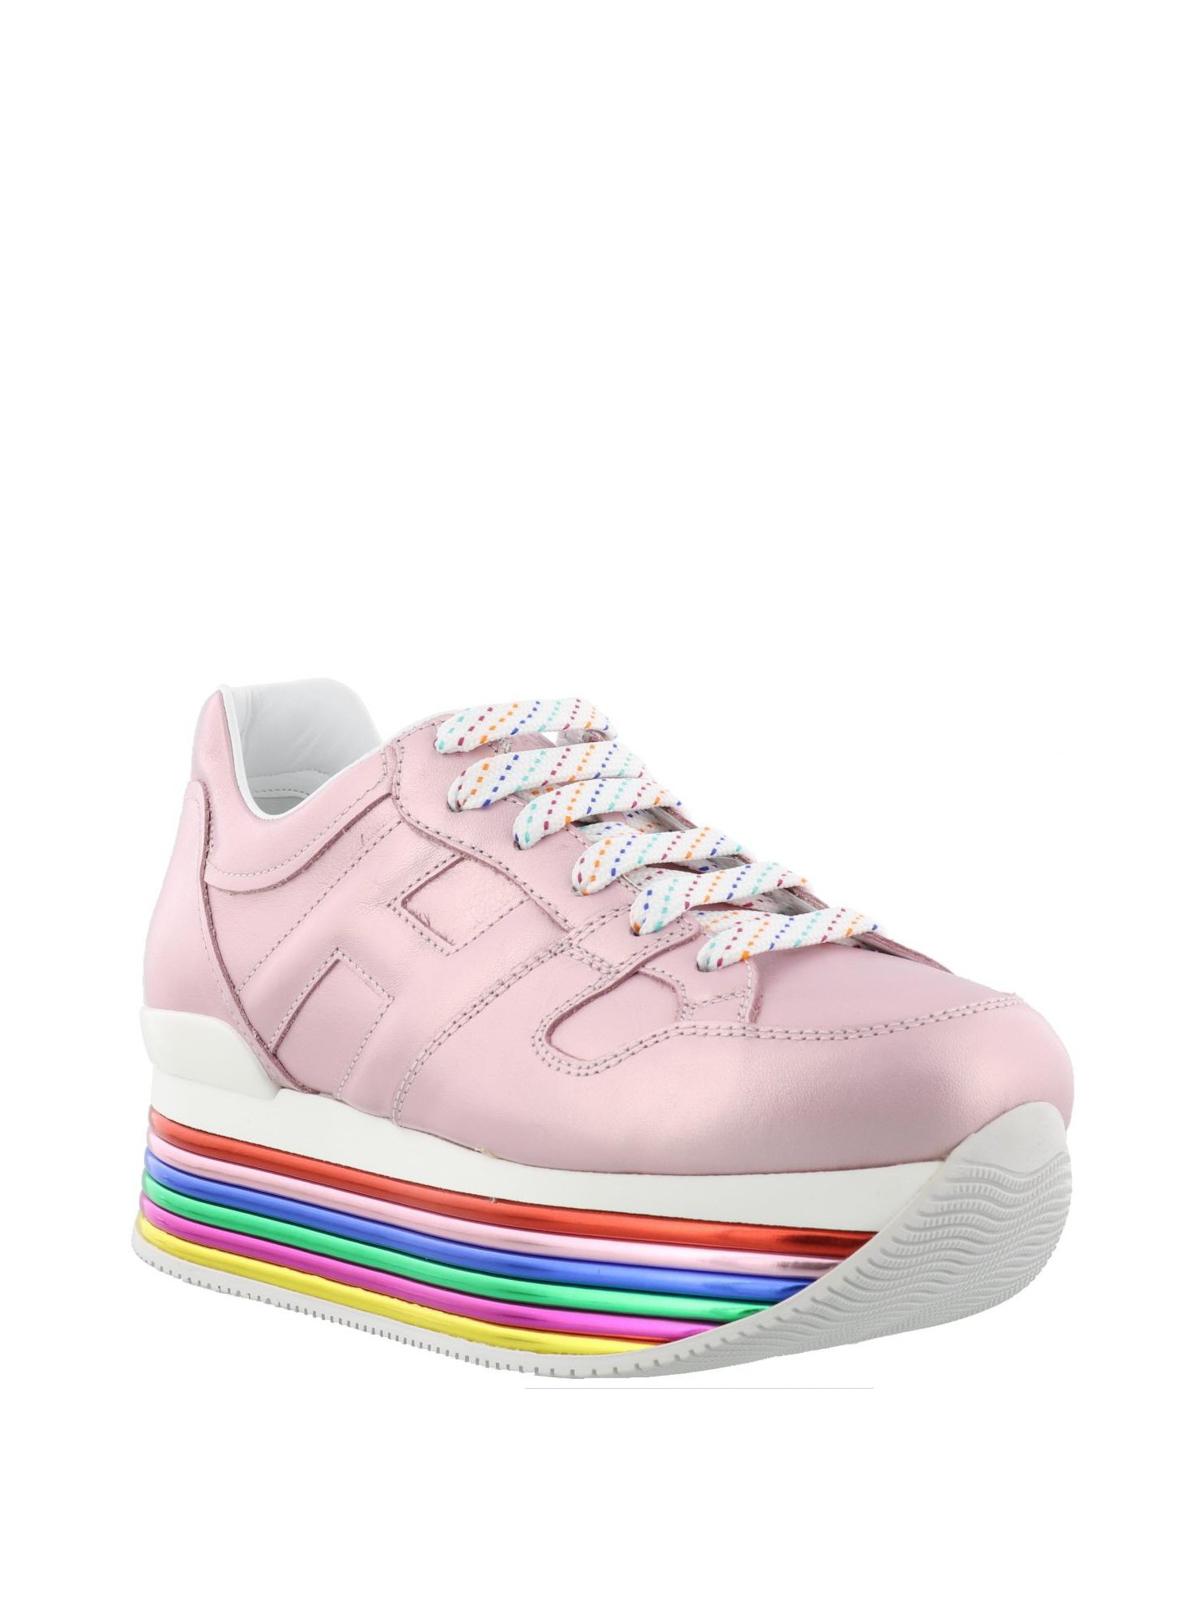 Hogan - Maxi H222 pink metallic sneakers - trainers - GYW3520T548SV0M417 407247f28f9